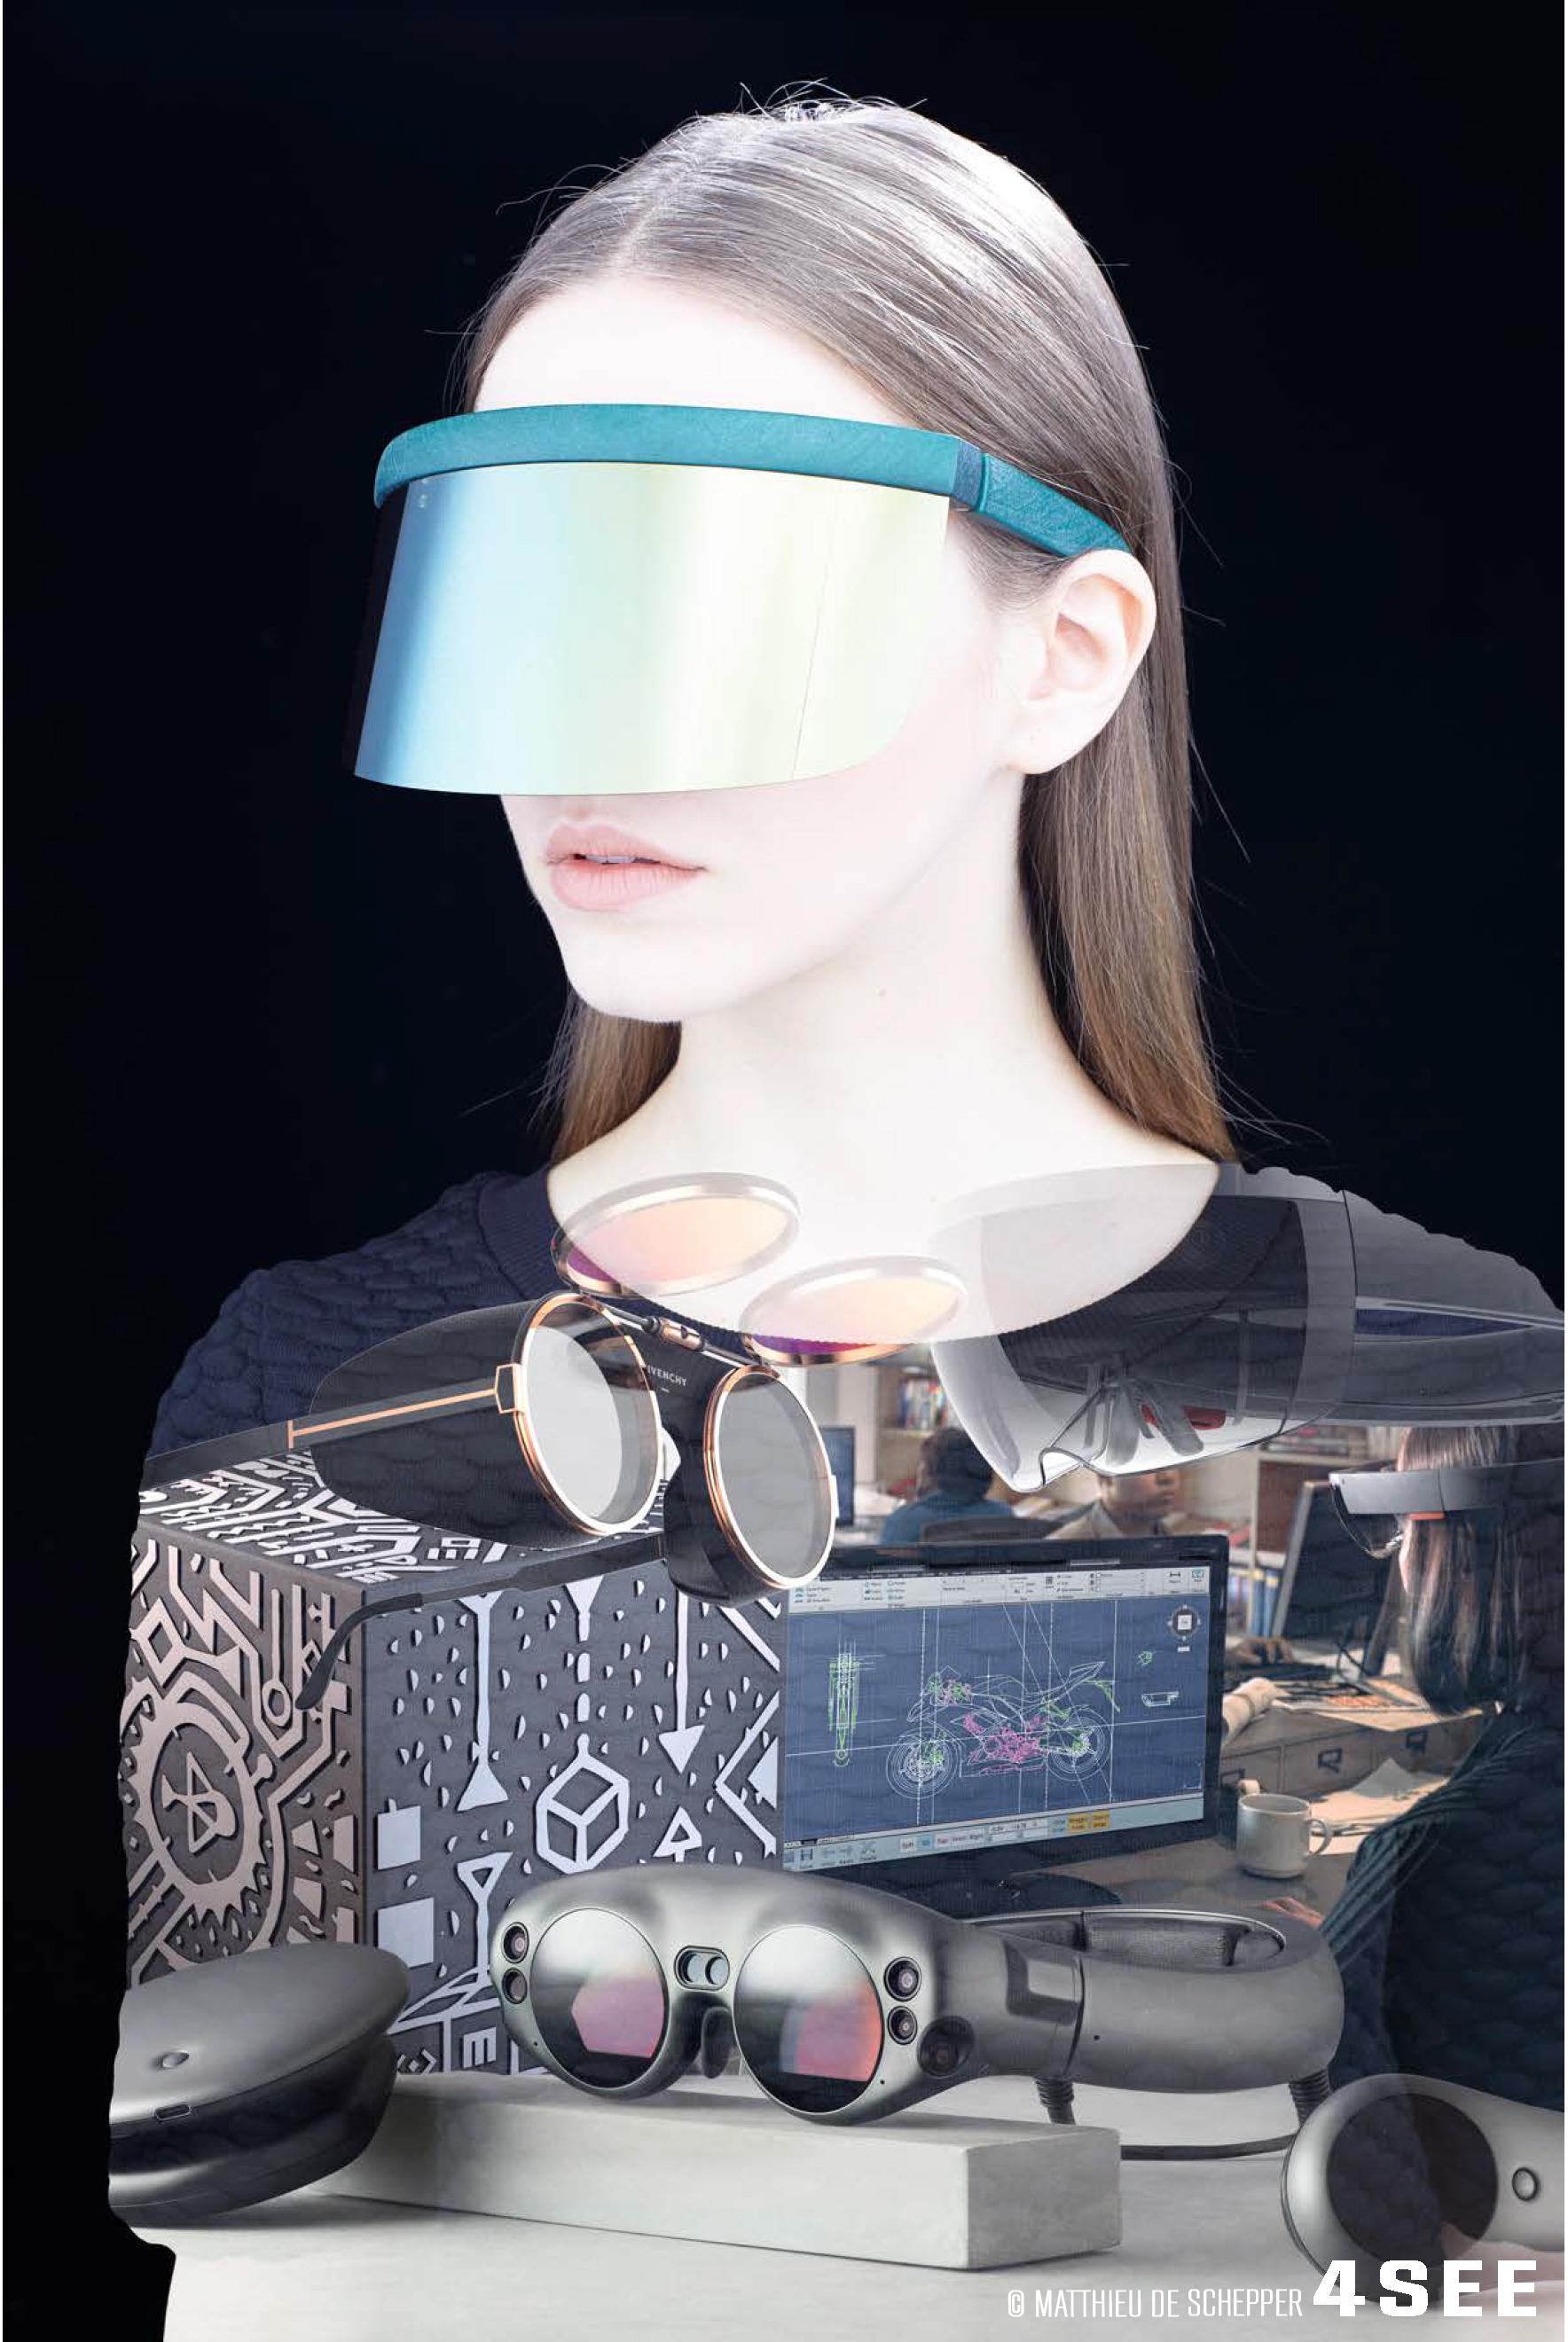 4SEE Opinion - Eyes on the Future, photo by Bert Spangemacher, artwork by Matthieu de Schepper